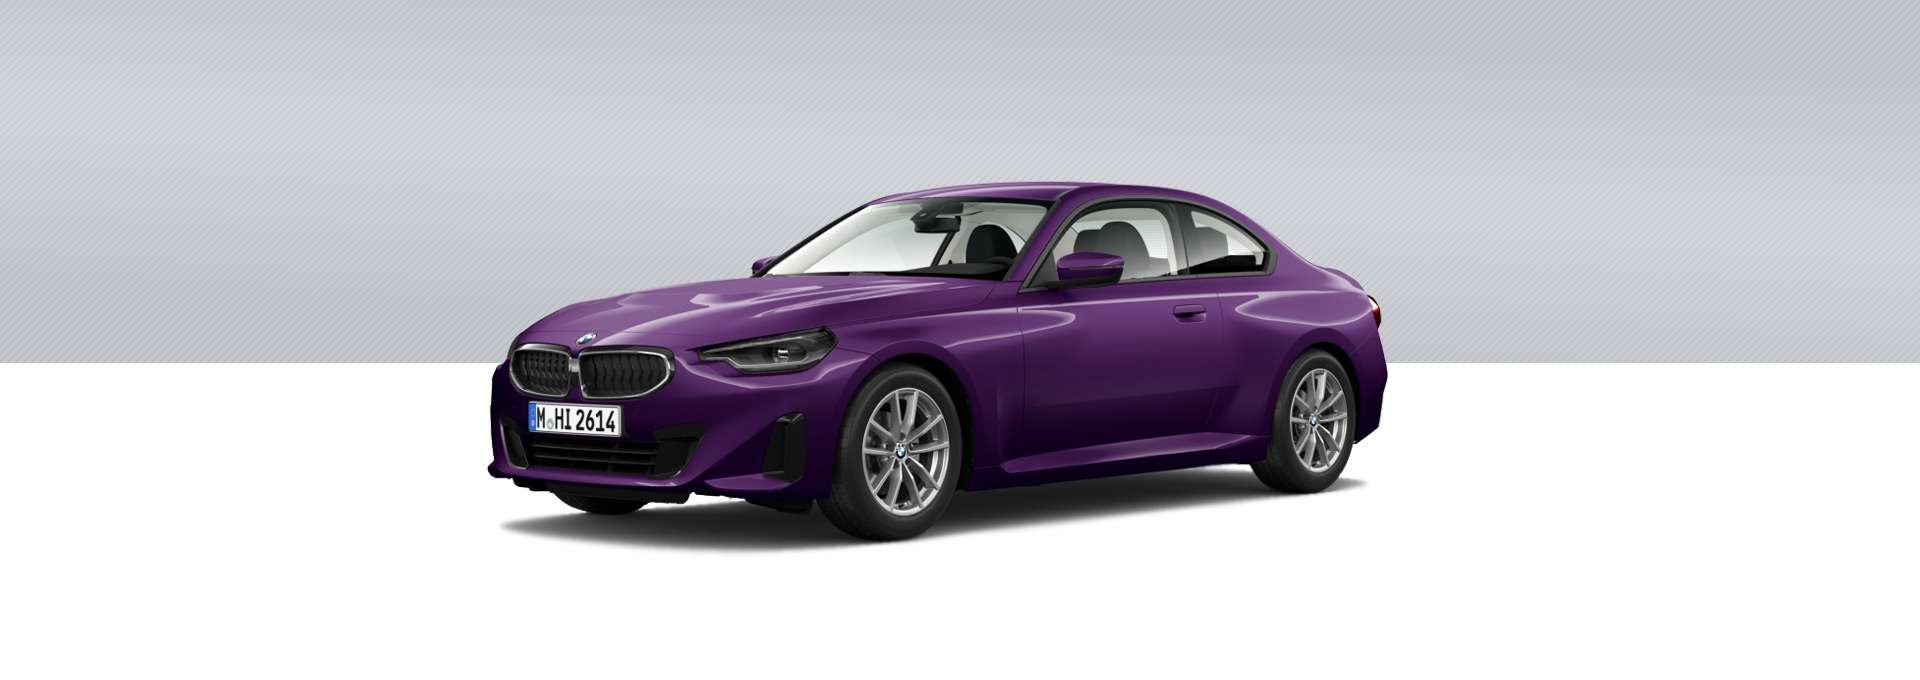 BMW Nuevo Serie 2 Coupé